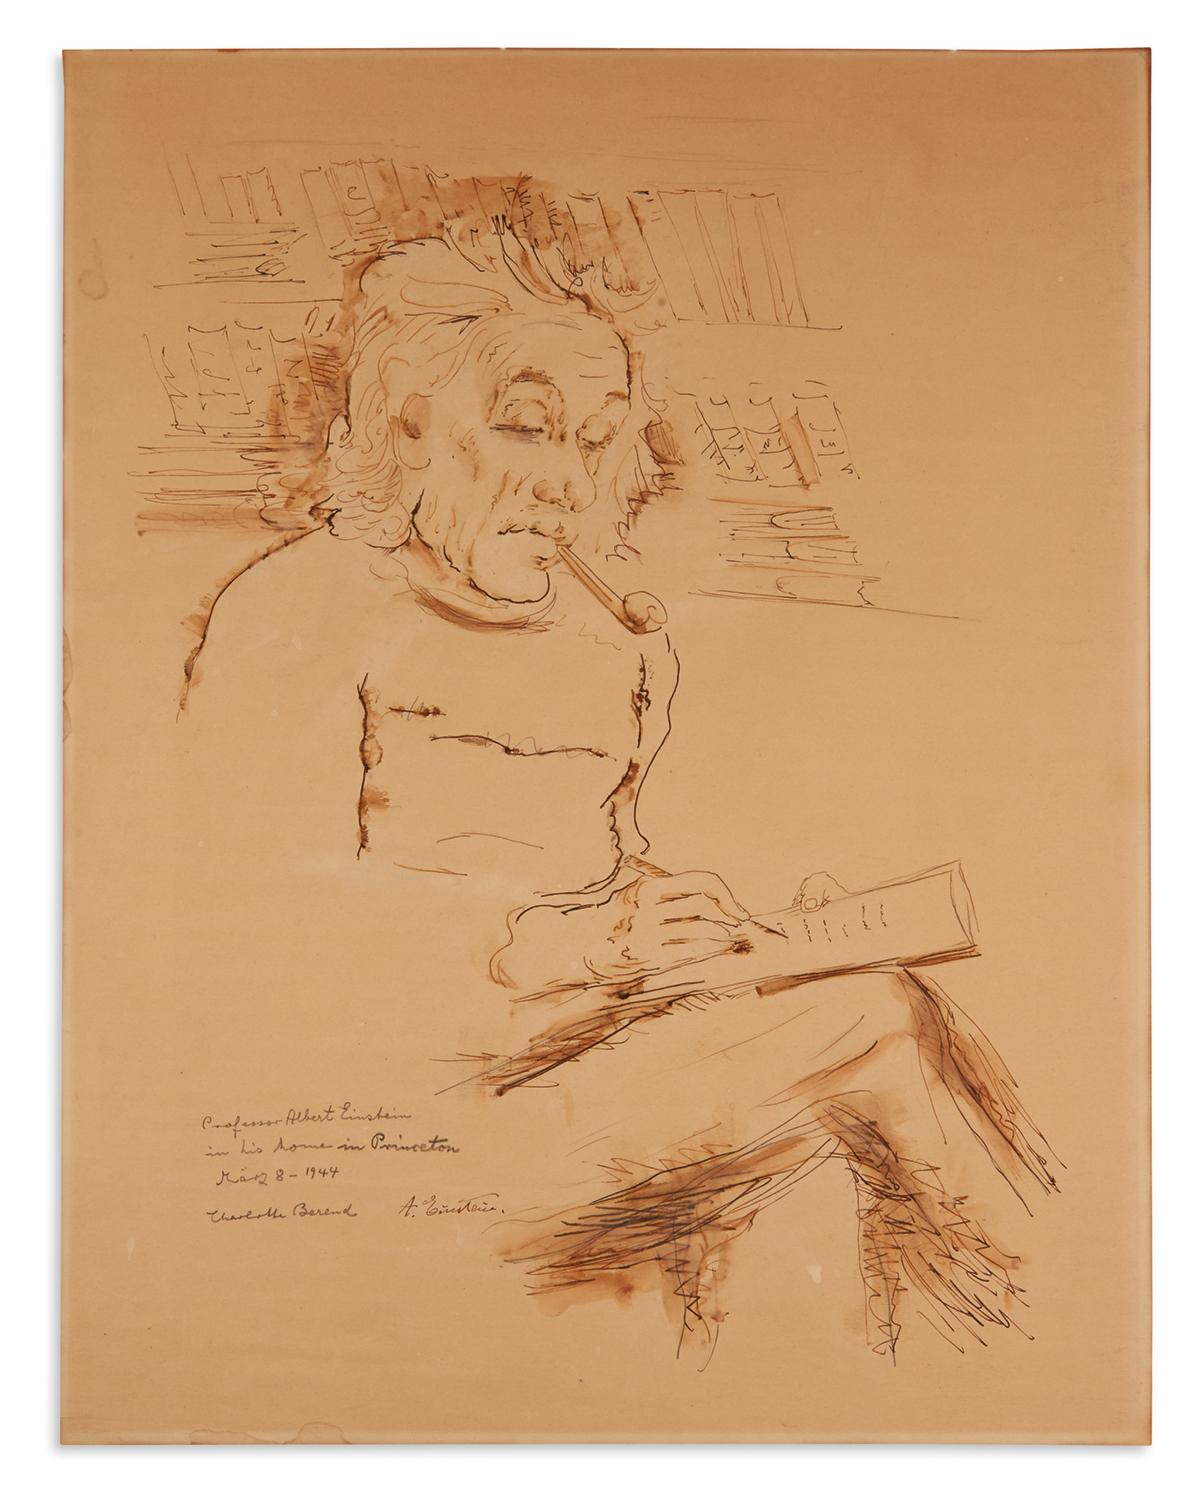 (SCIENTISTS.) EINSTEIN, ALBERT. Half-length portrait in ink and wash by Charlotte Berend-Corinth Signed at lower left, A. Einstein, s